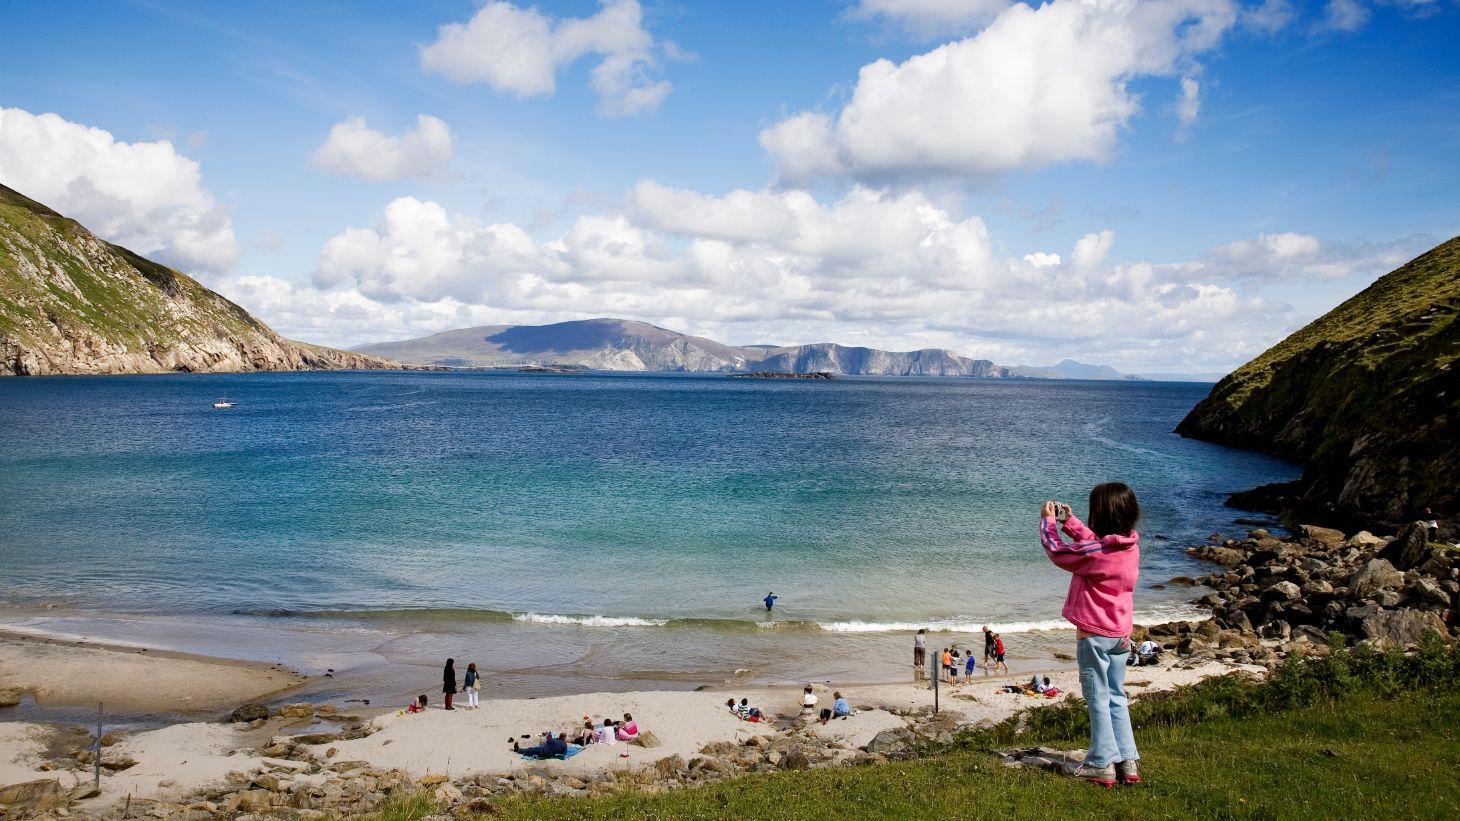 Take the whole family to the idyllic Keem Bay.